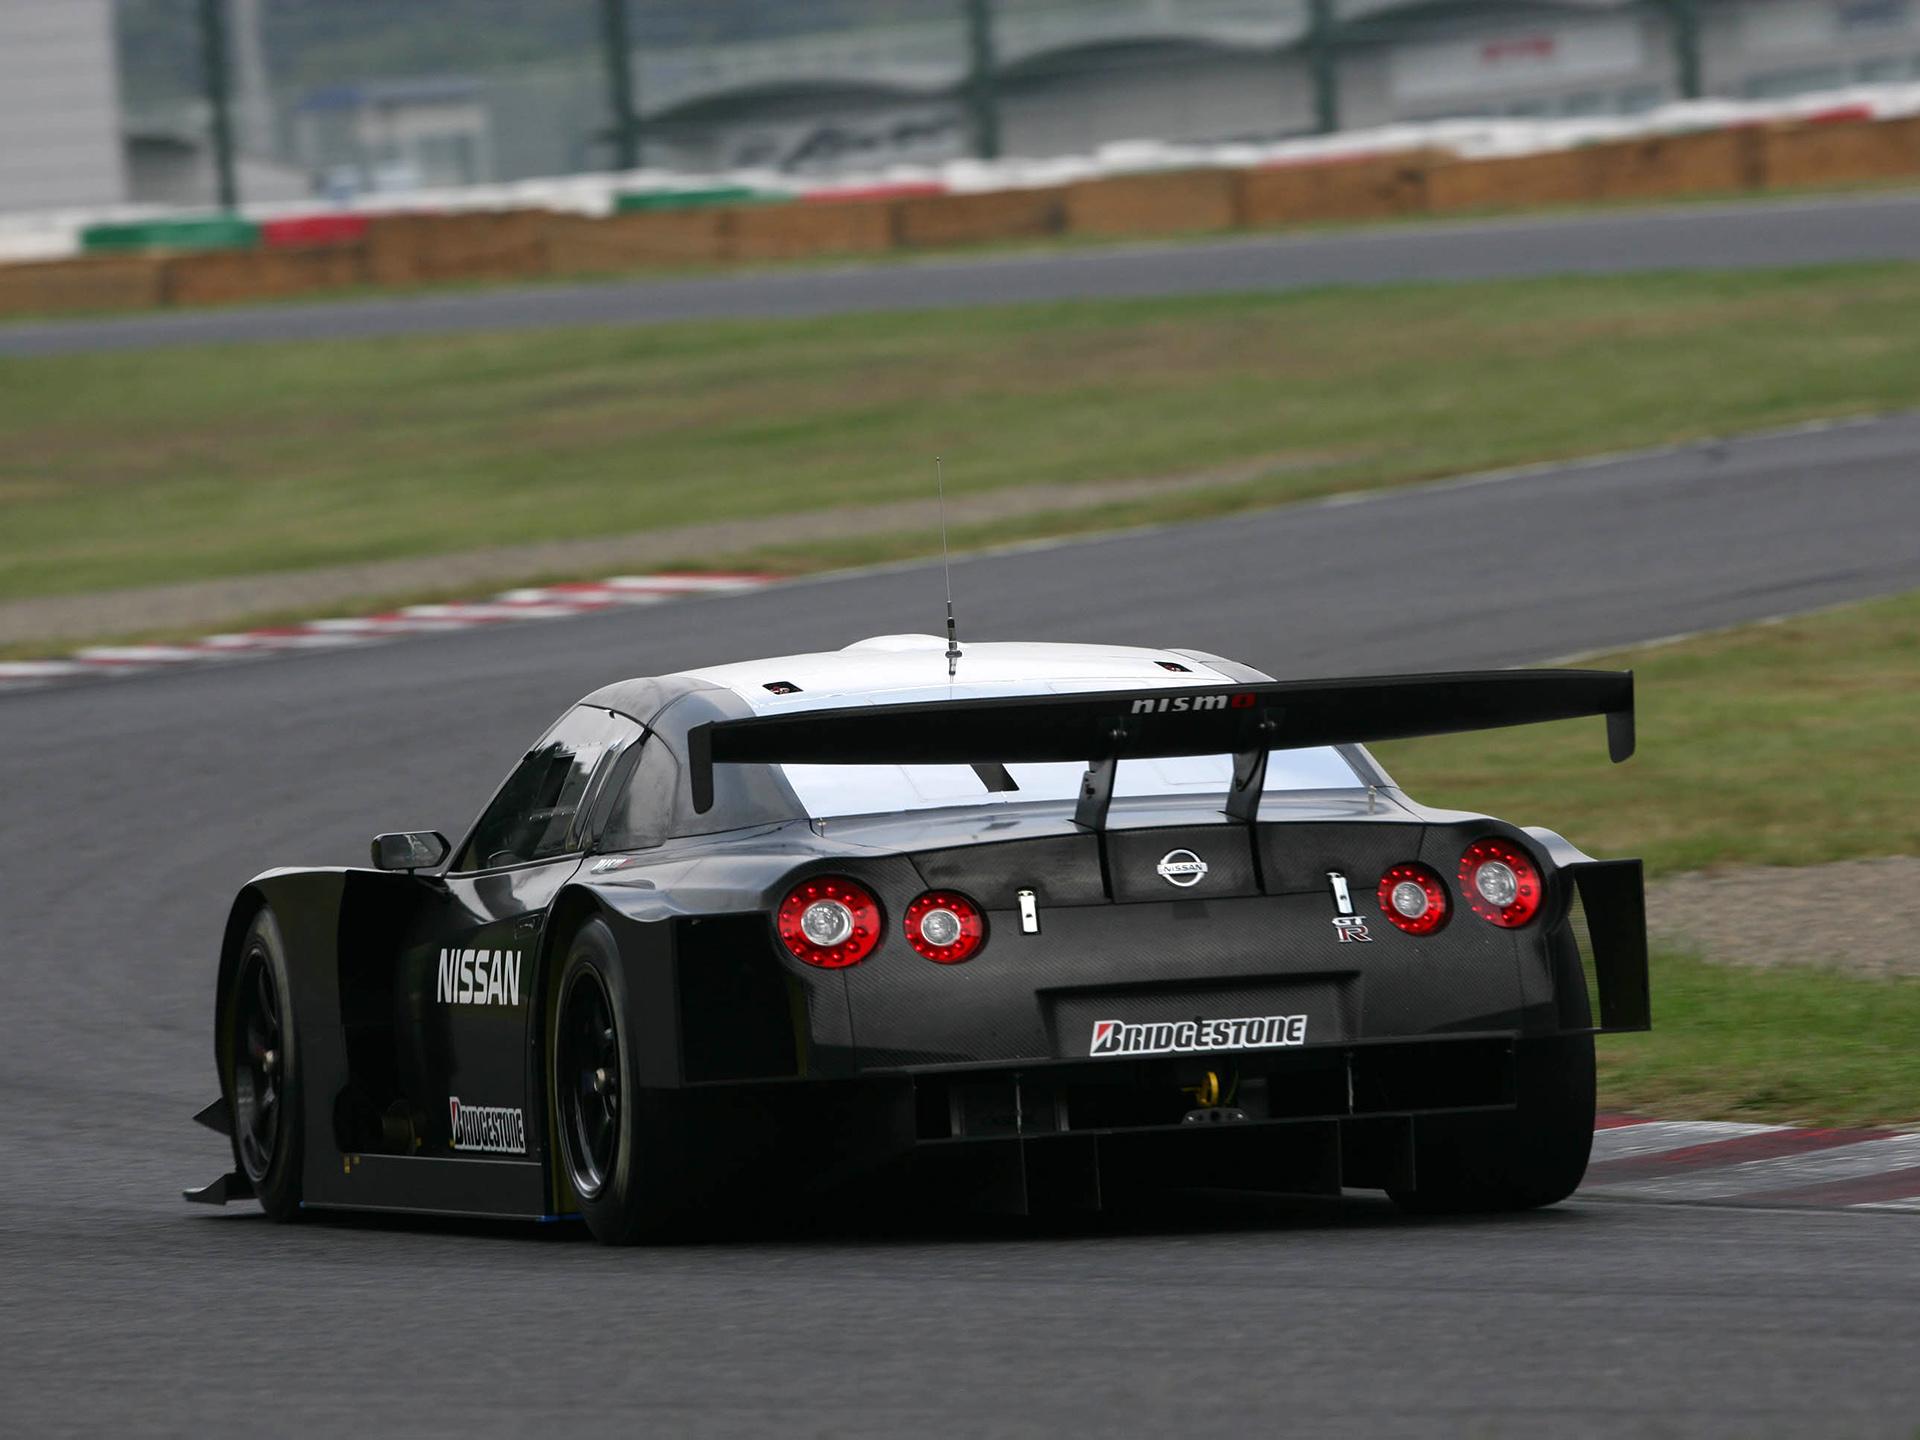 Nissan GT-R GT500 photo 50246